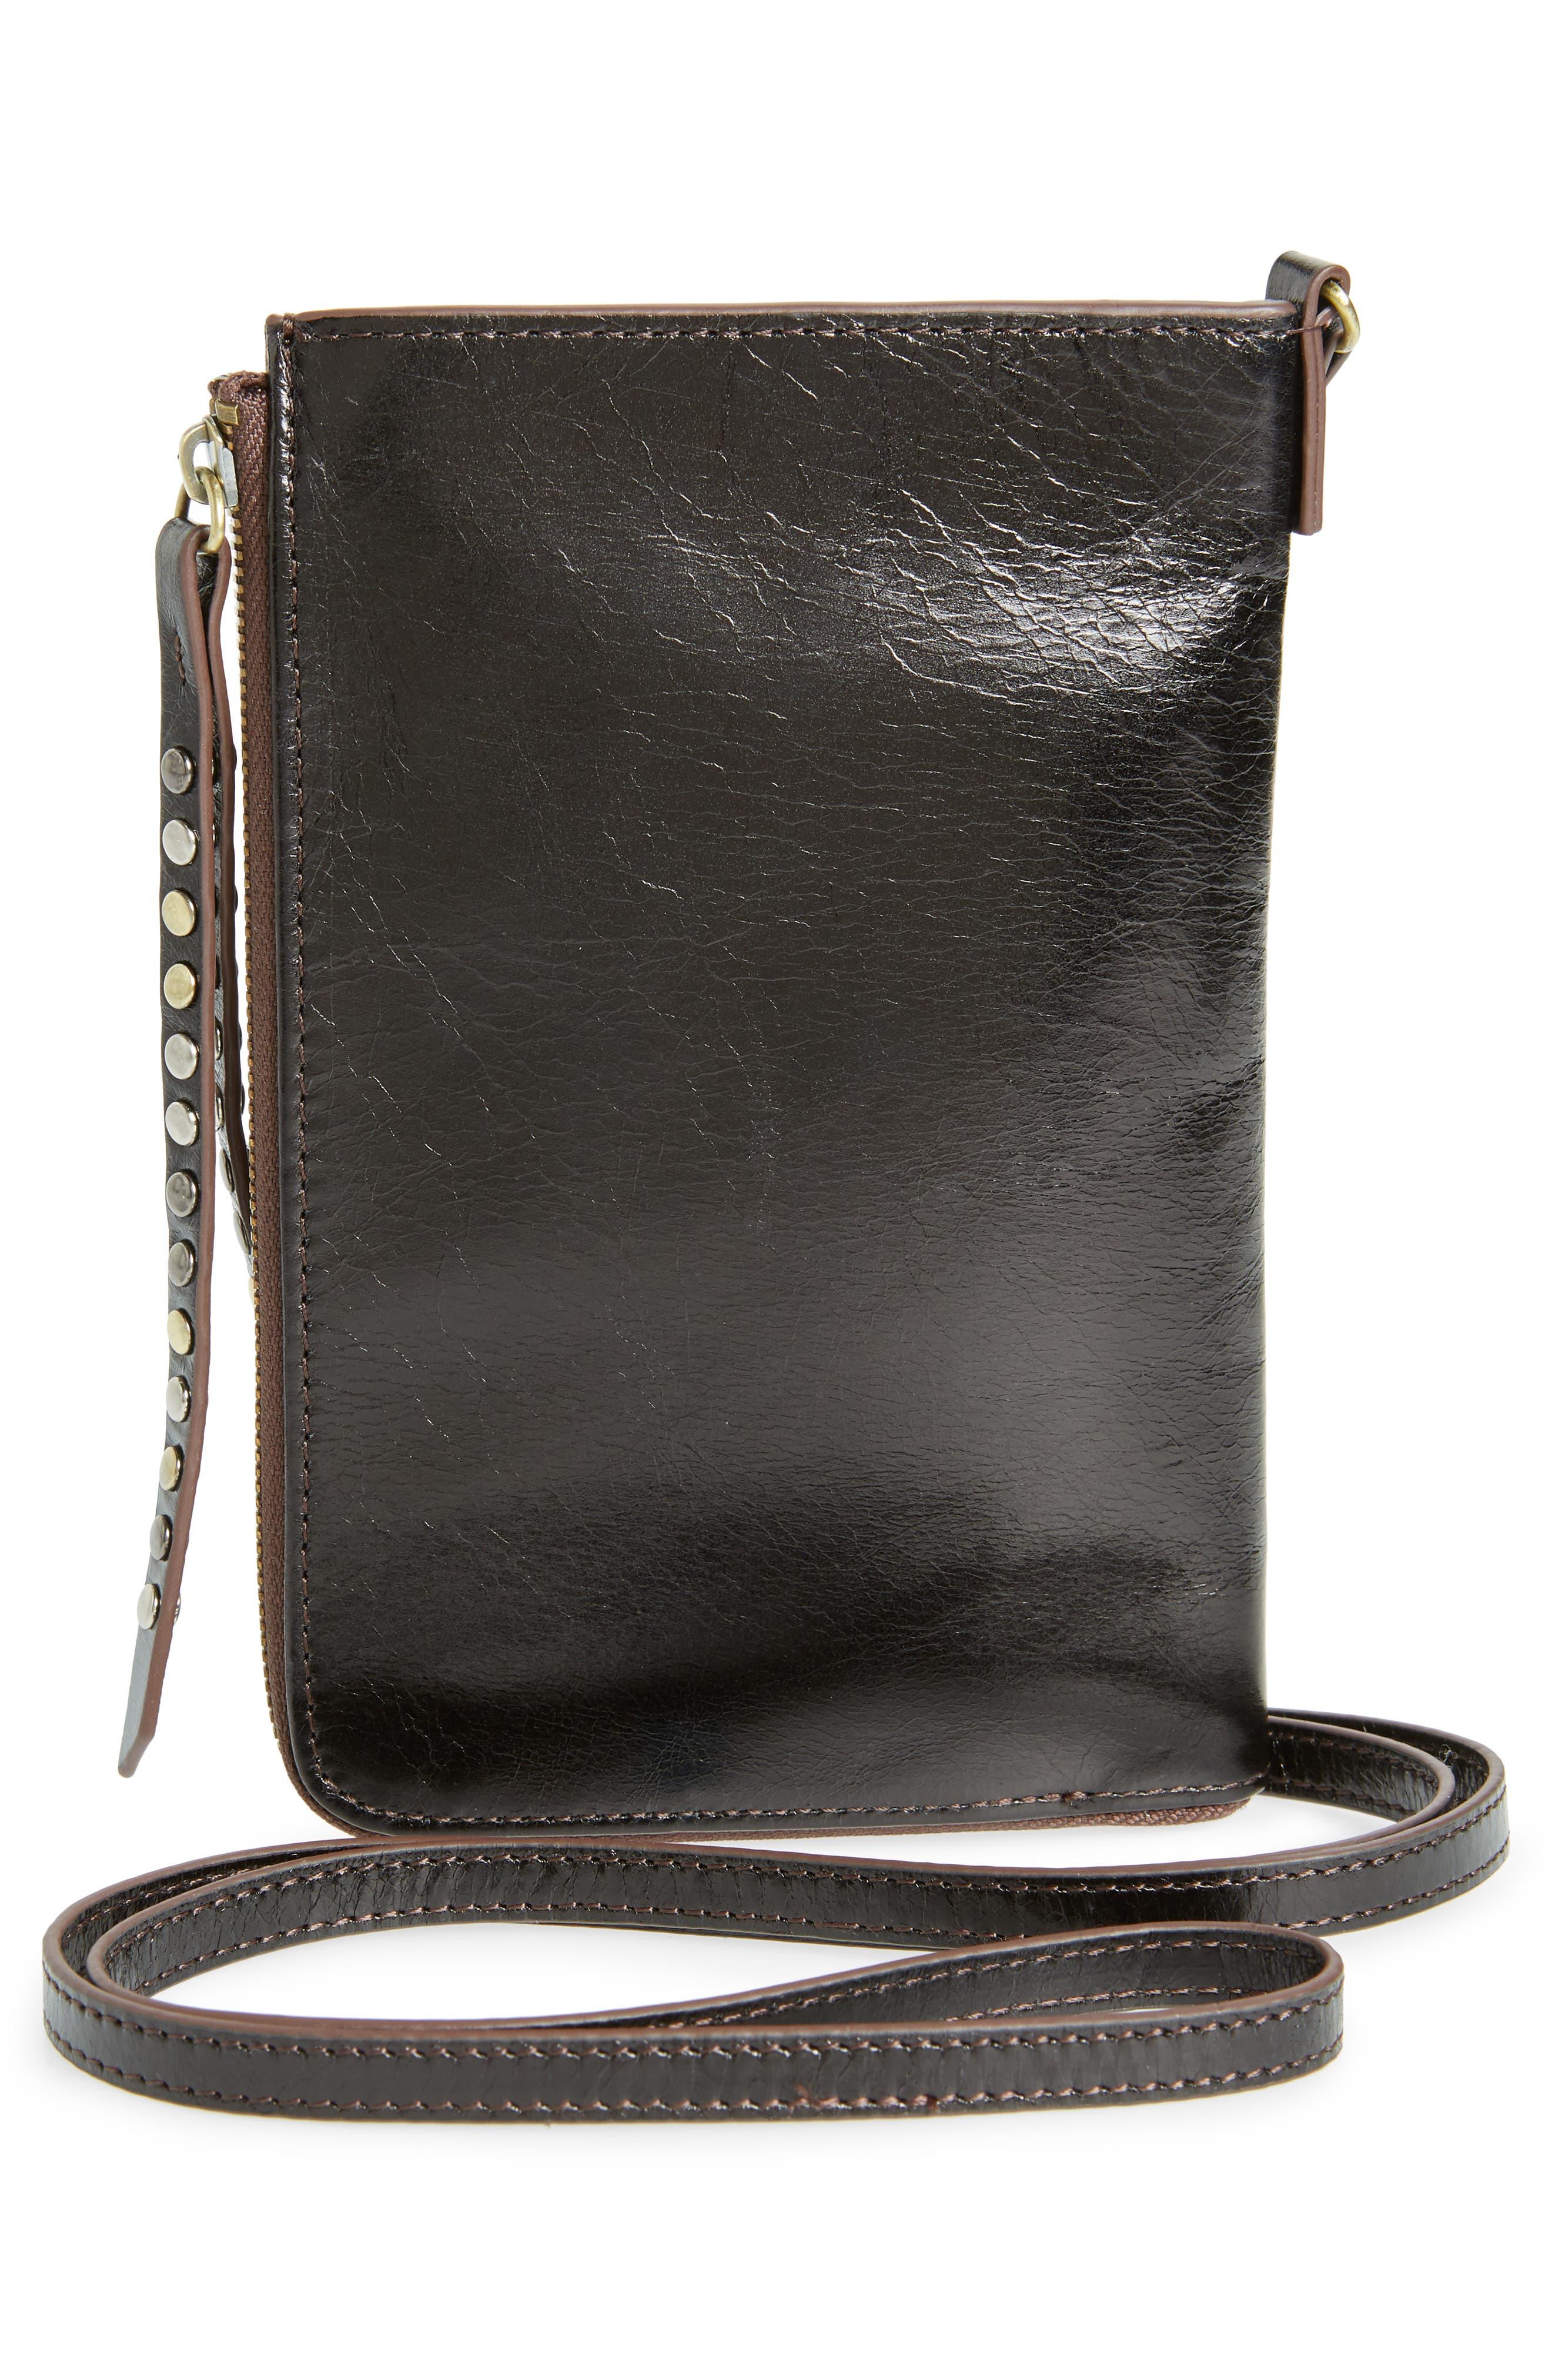 HOBO,                             Moxie Leather Crossbody Bag,                             Alternate thumbnail 3, color,                             BLACK